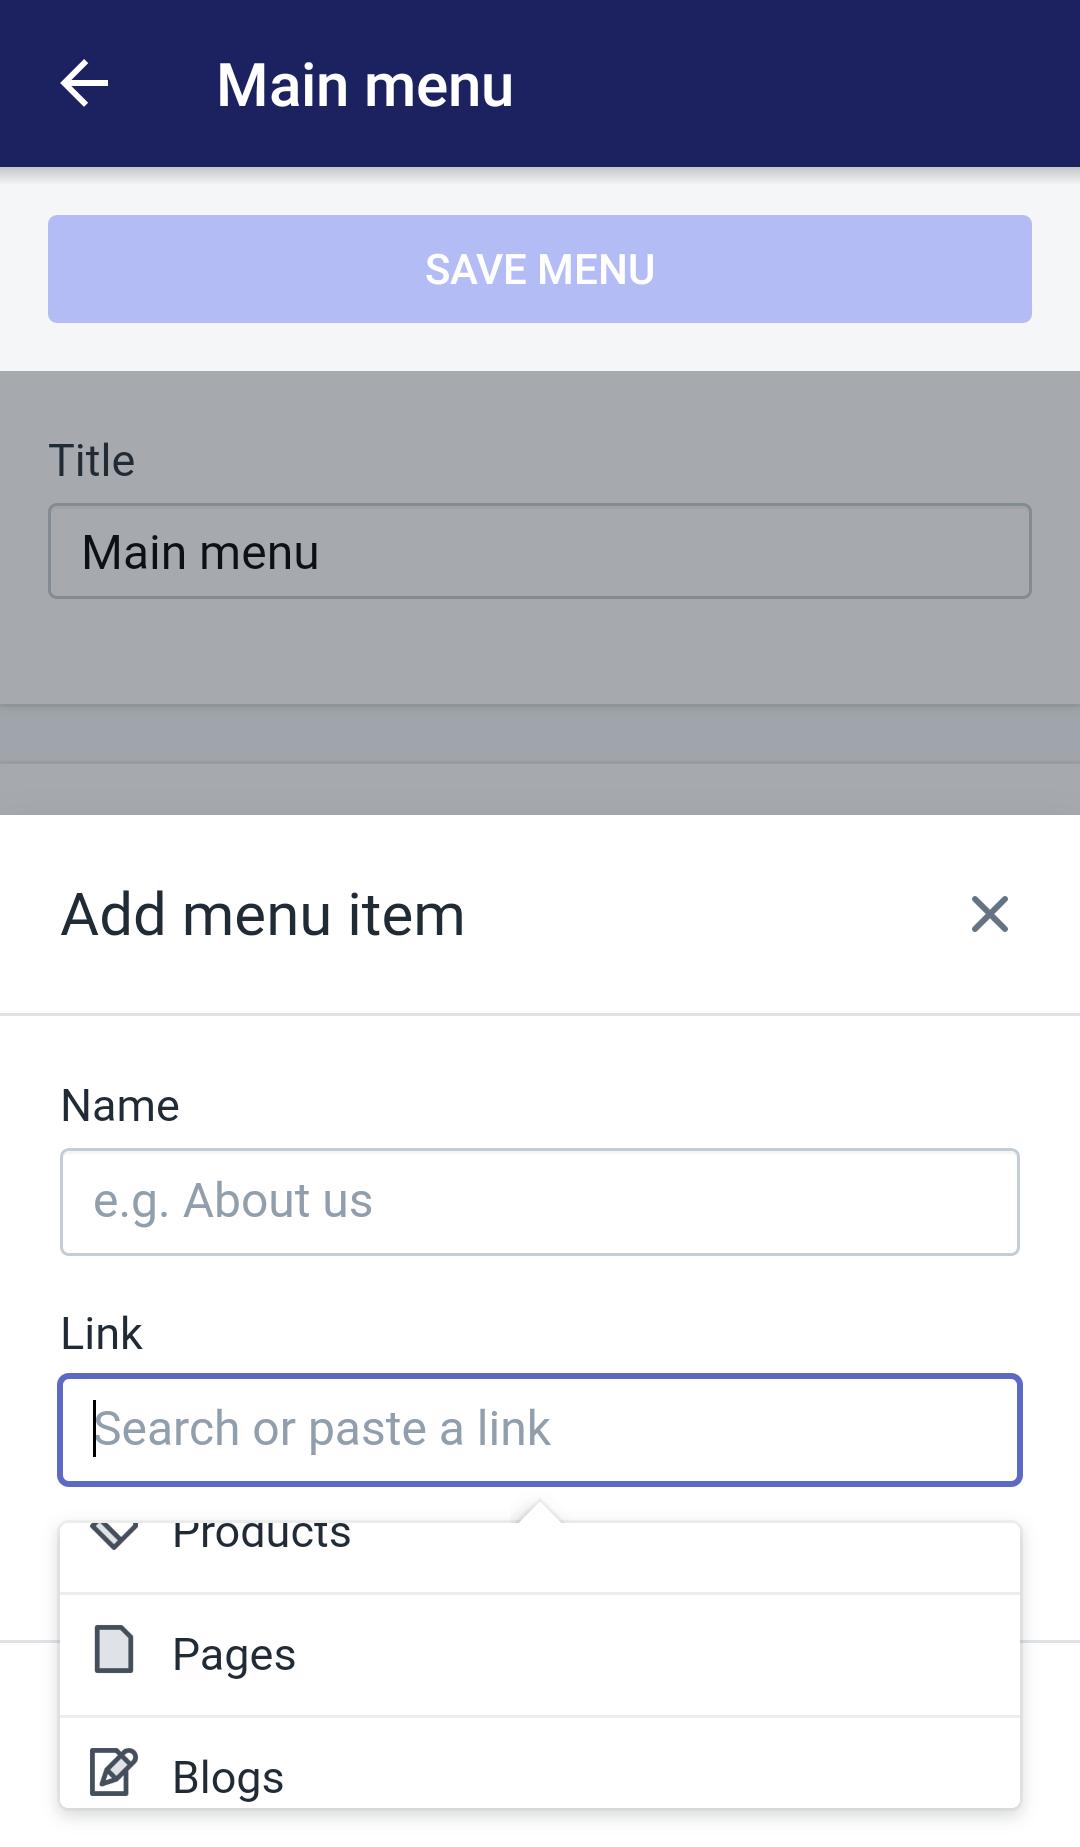 Add menu item13